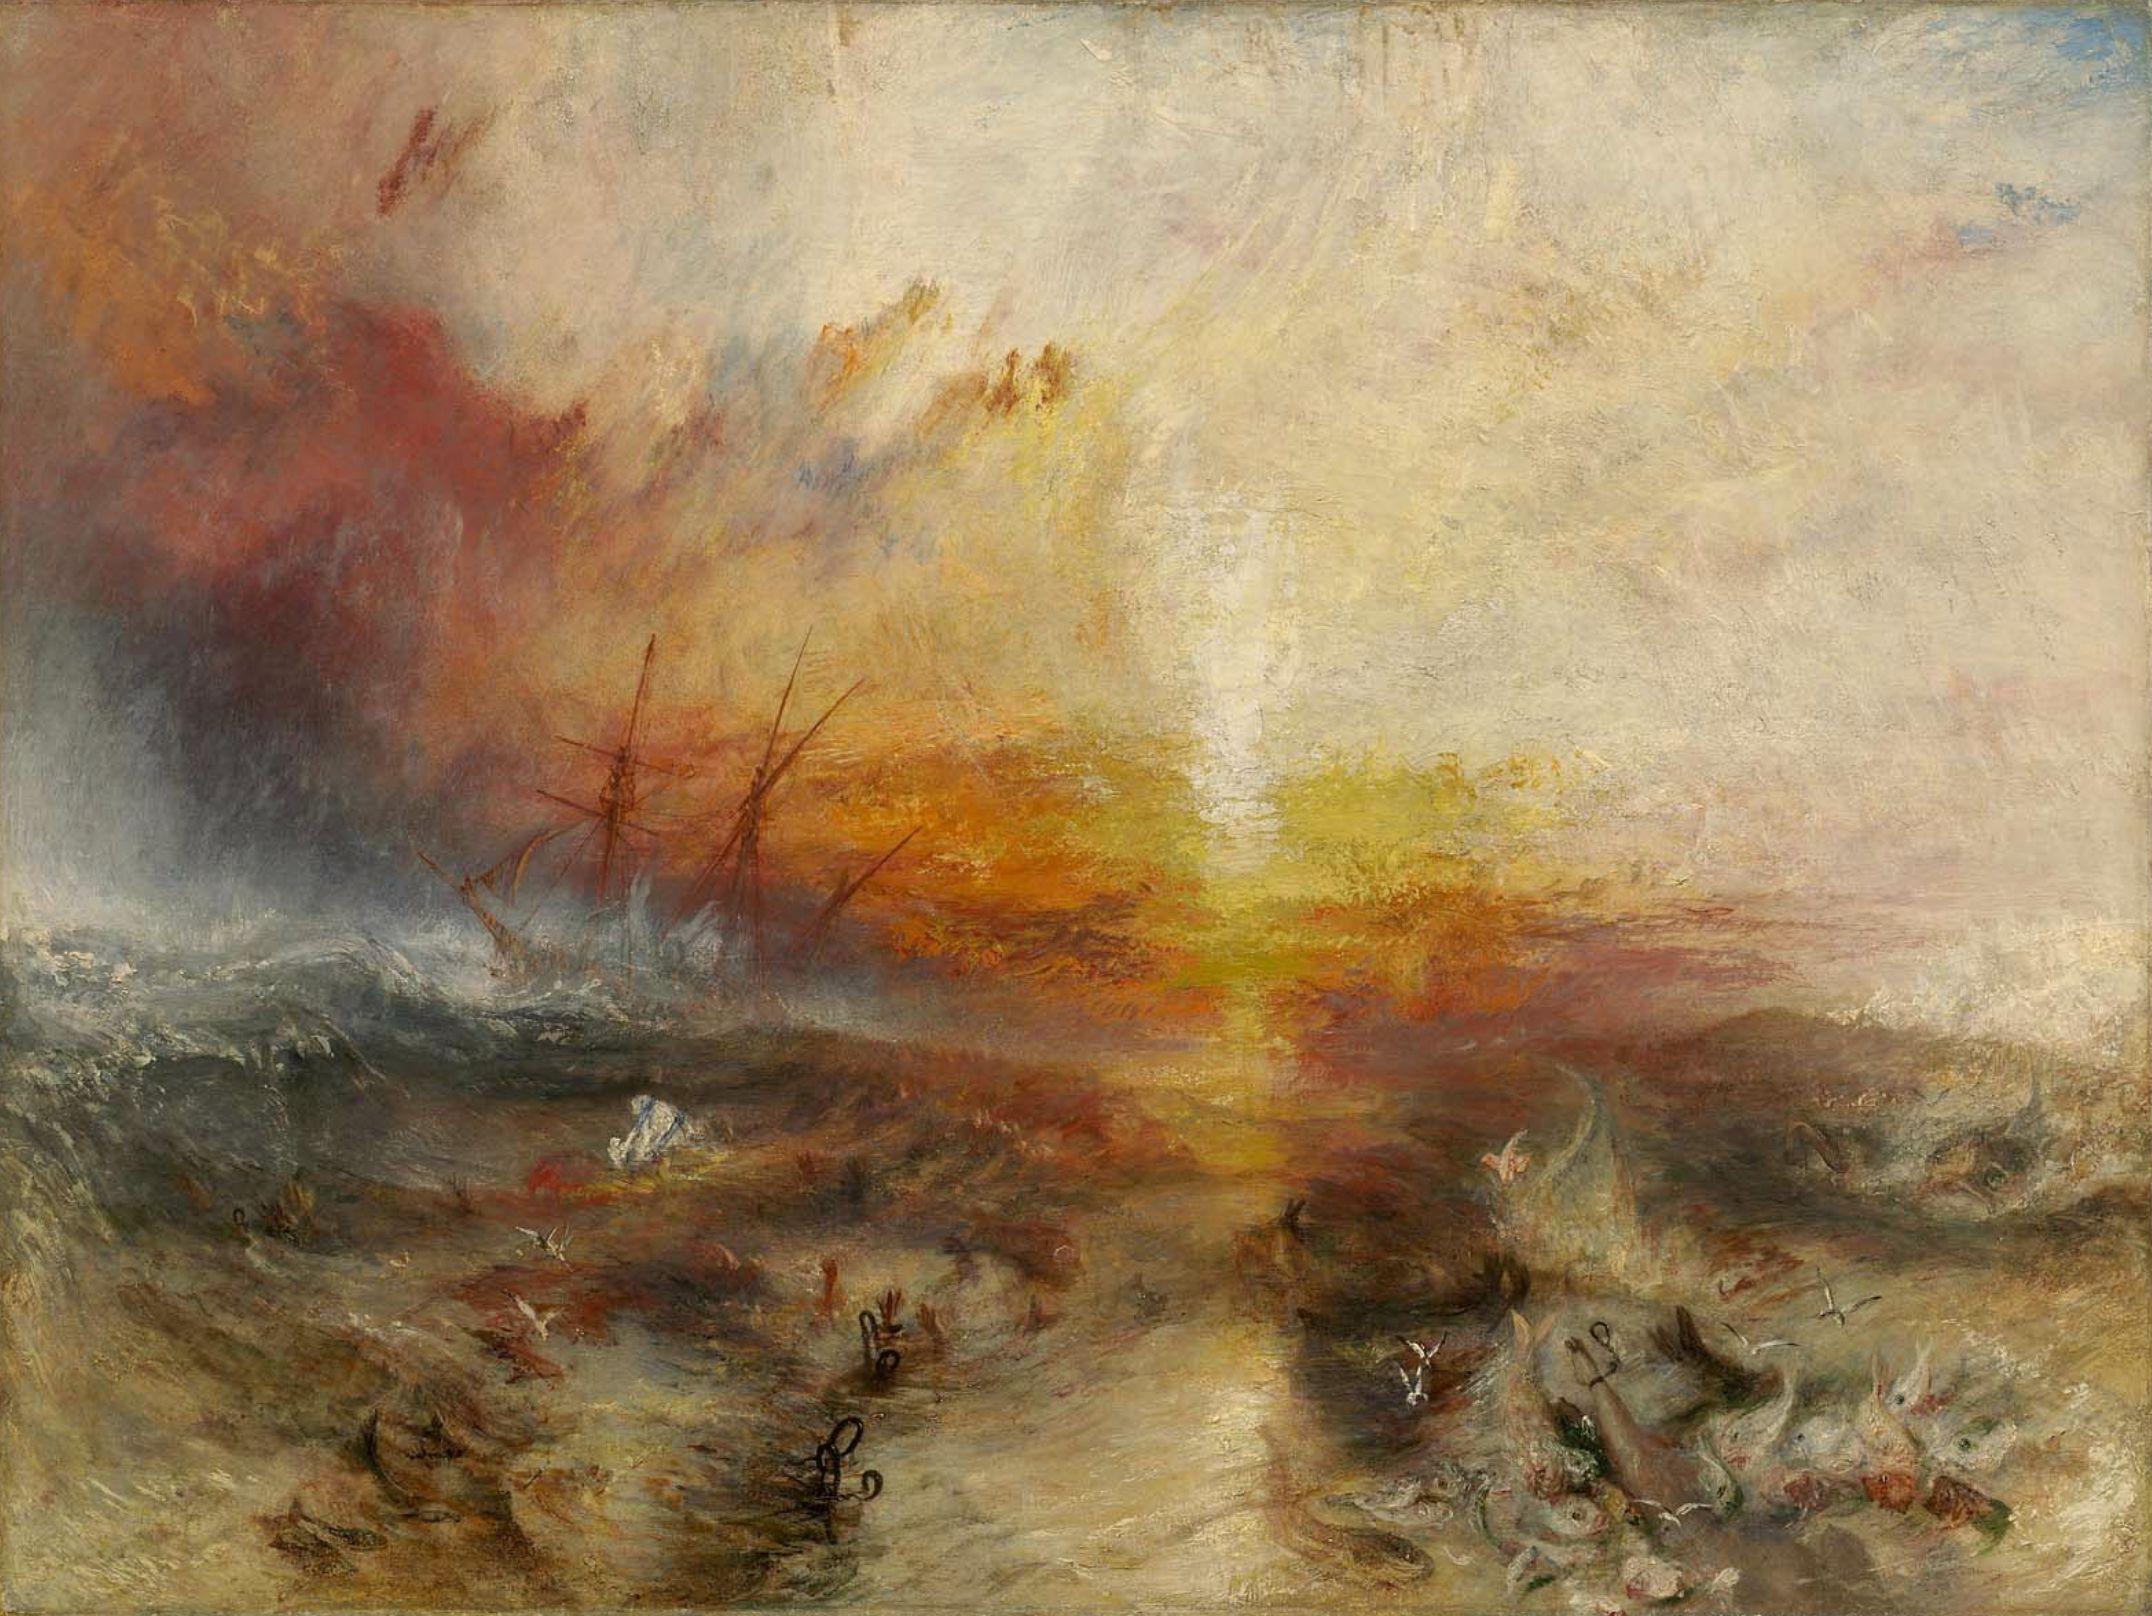 "J.M.W. Turner ""The Slave Ship"" 1840. Oil on canvas."